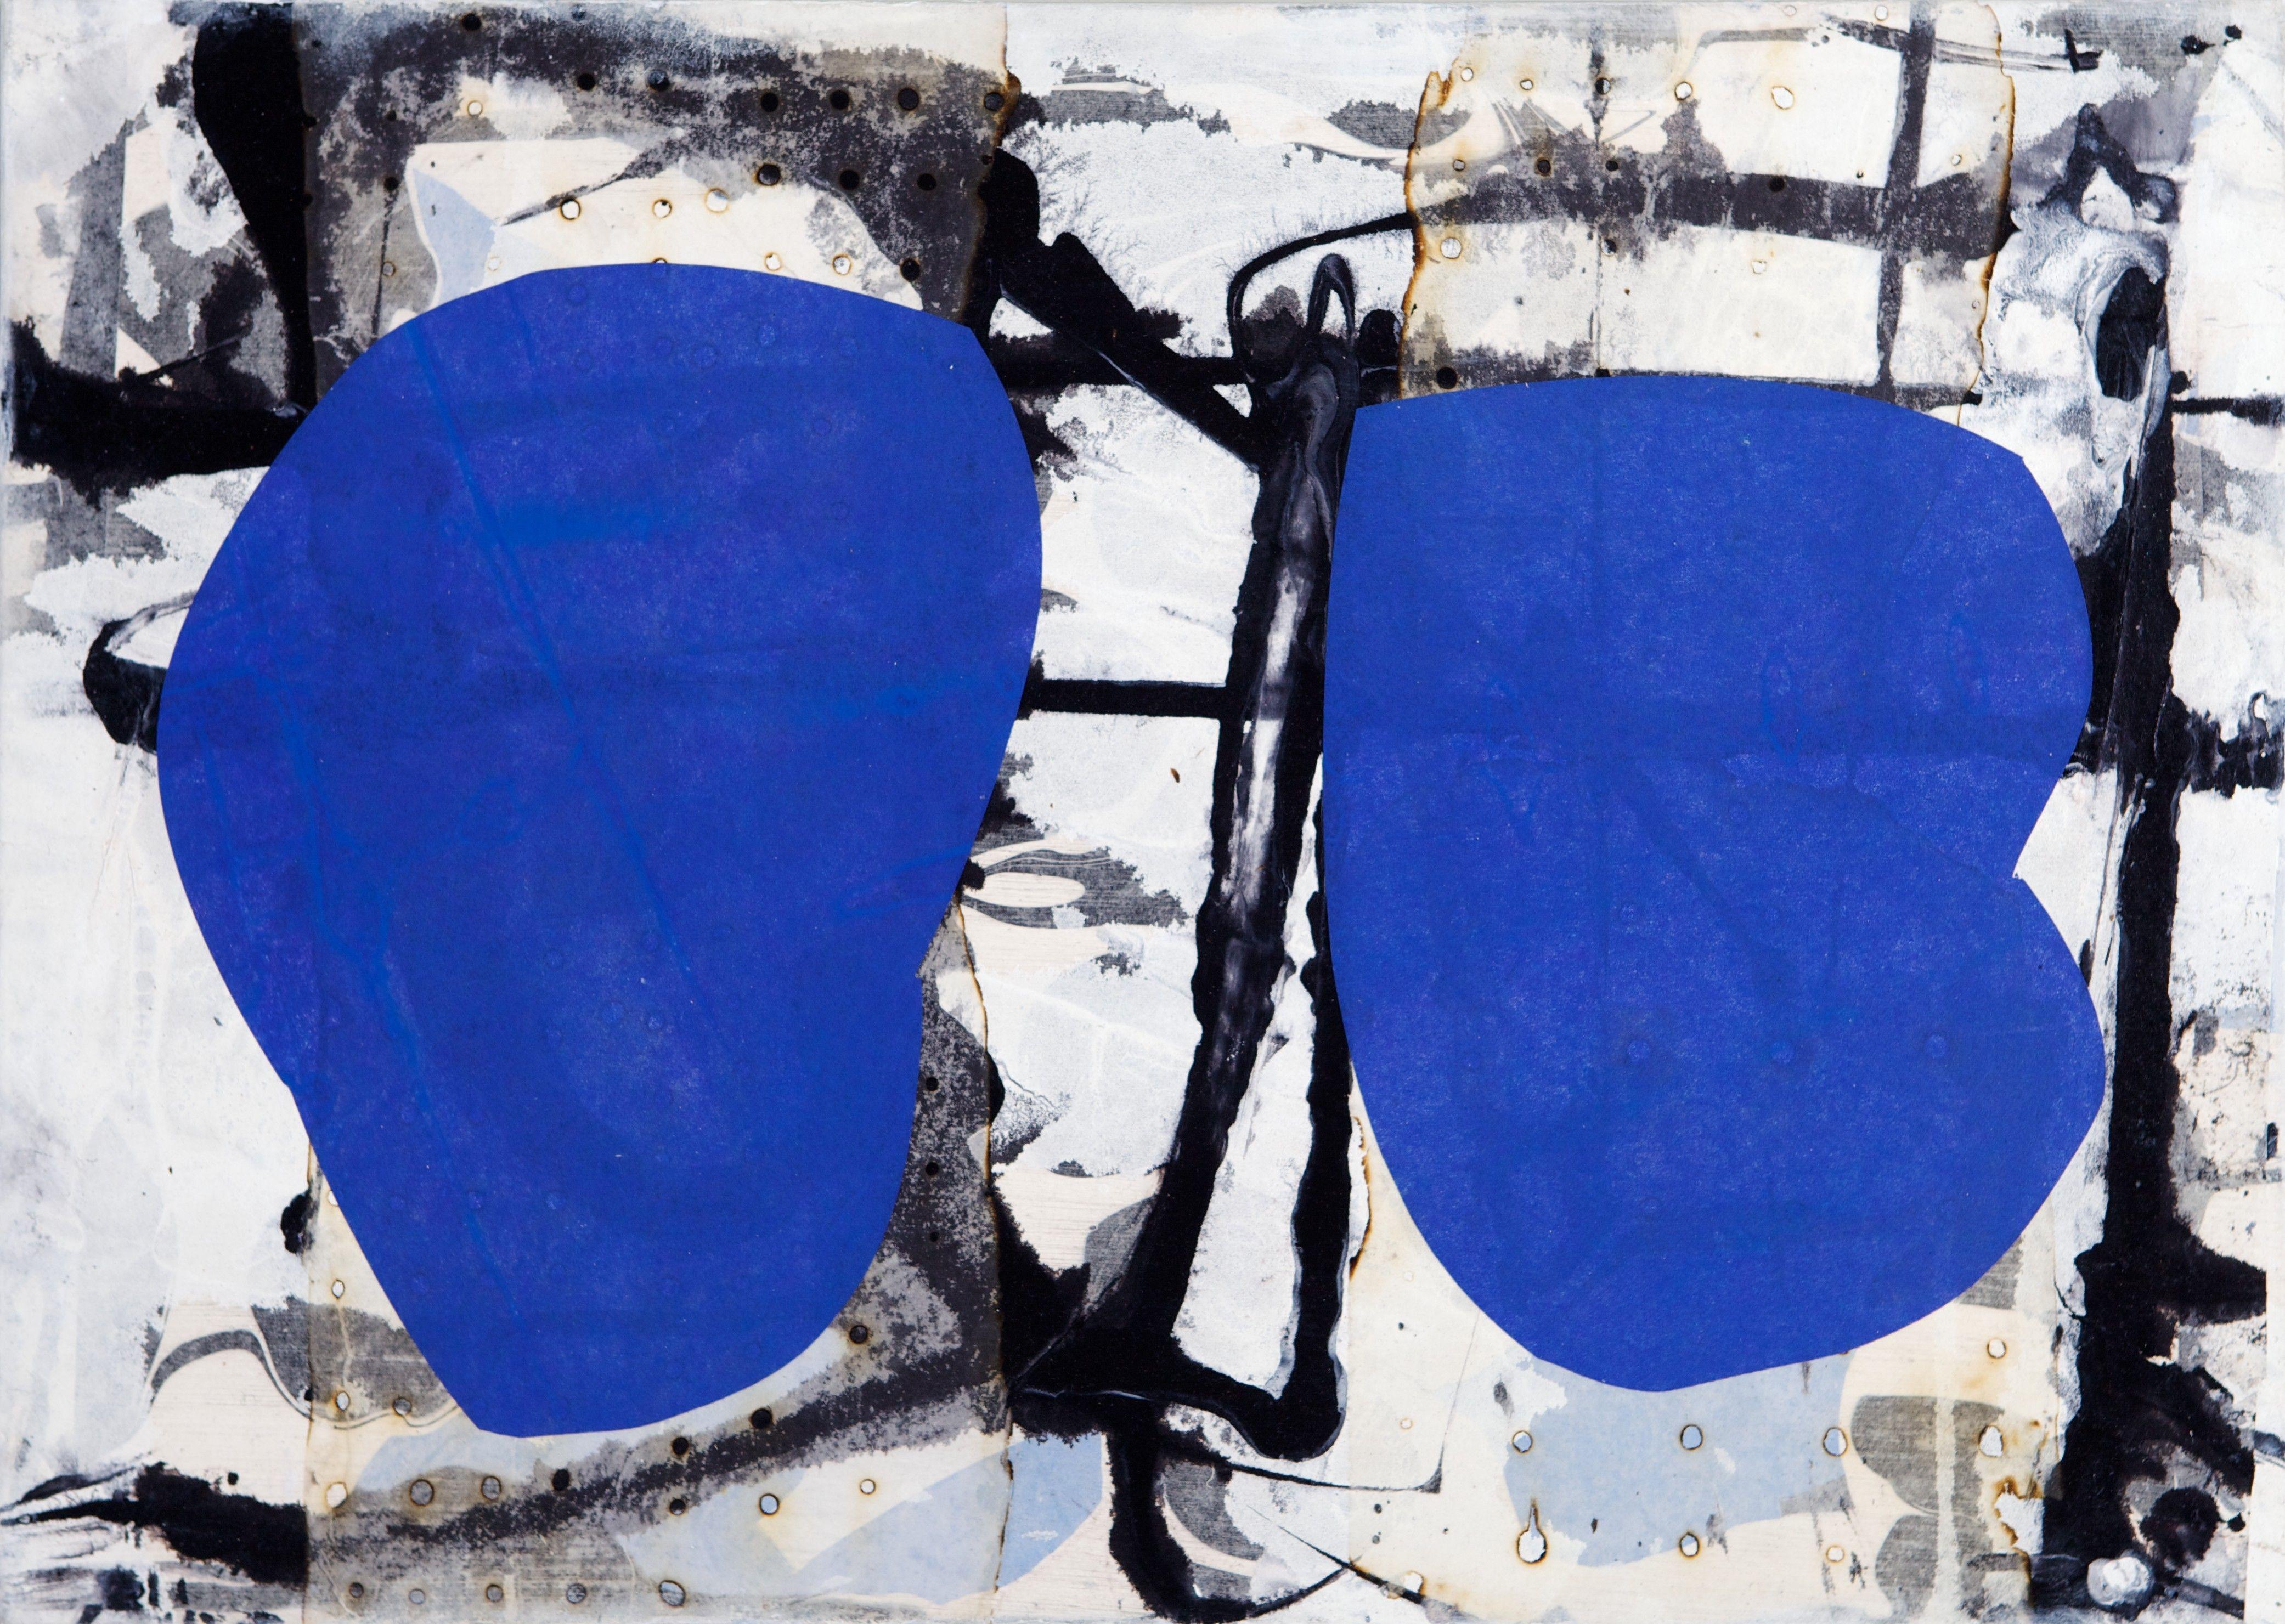 Jukka Mäkelä: Blue I, 2009, akryyli, 50x70 cm - Hagelstam K131